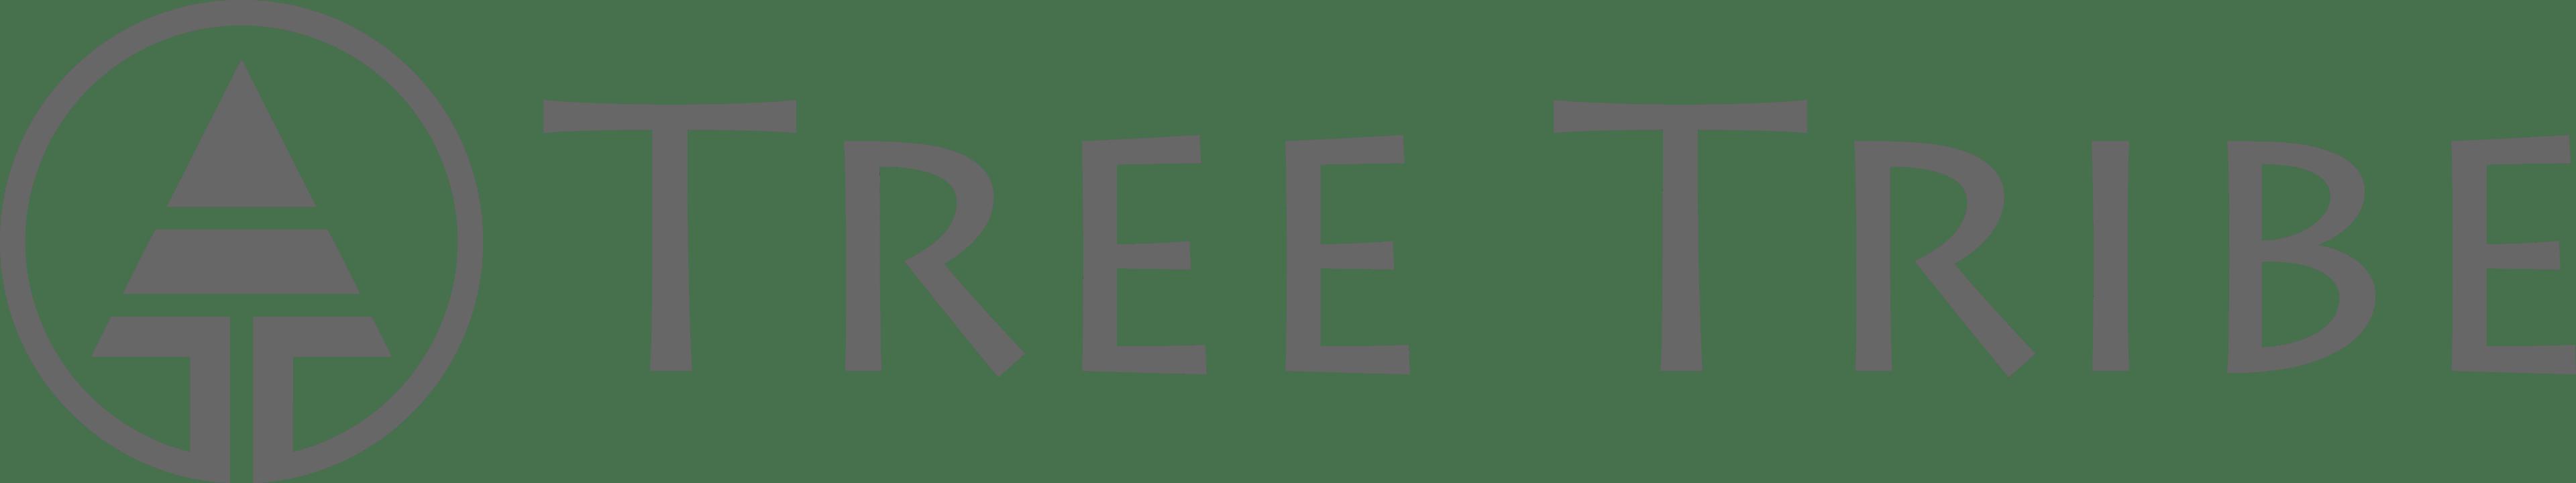 treetribe.com - top eco-friendy product influencer brand